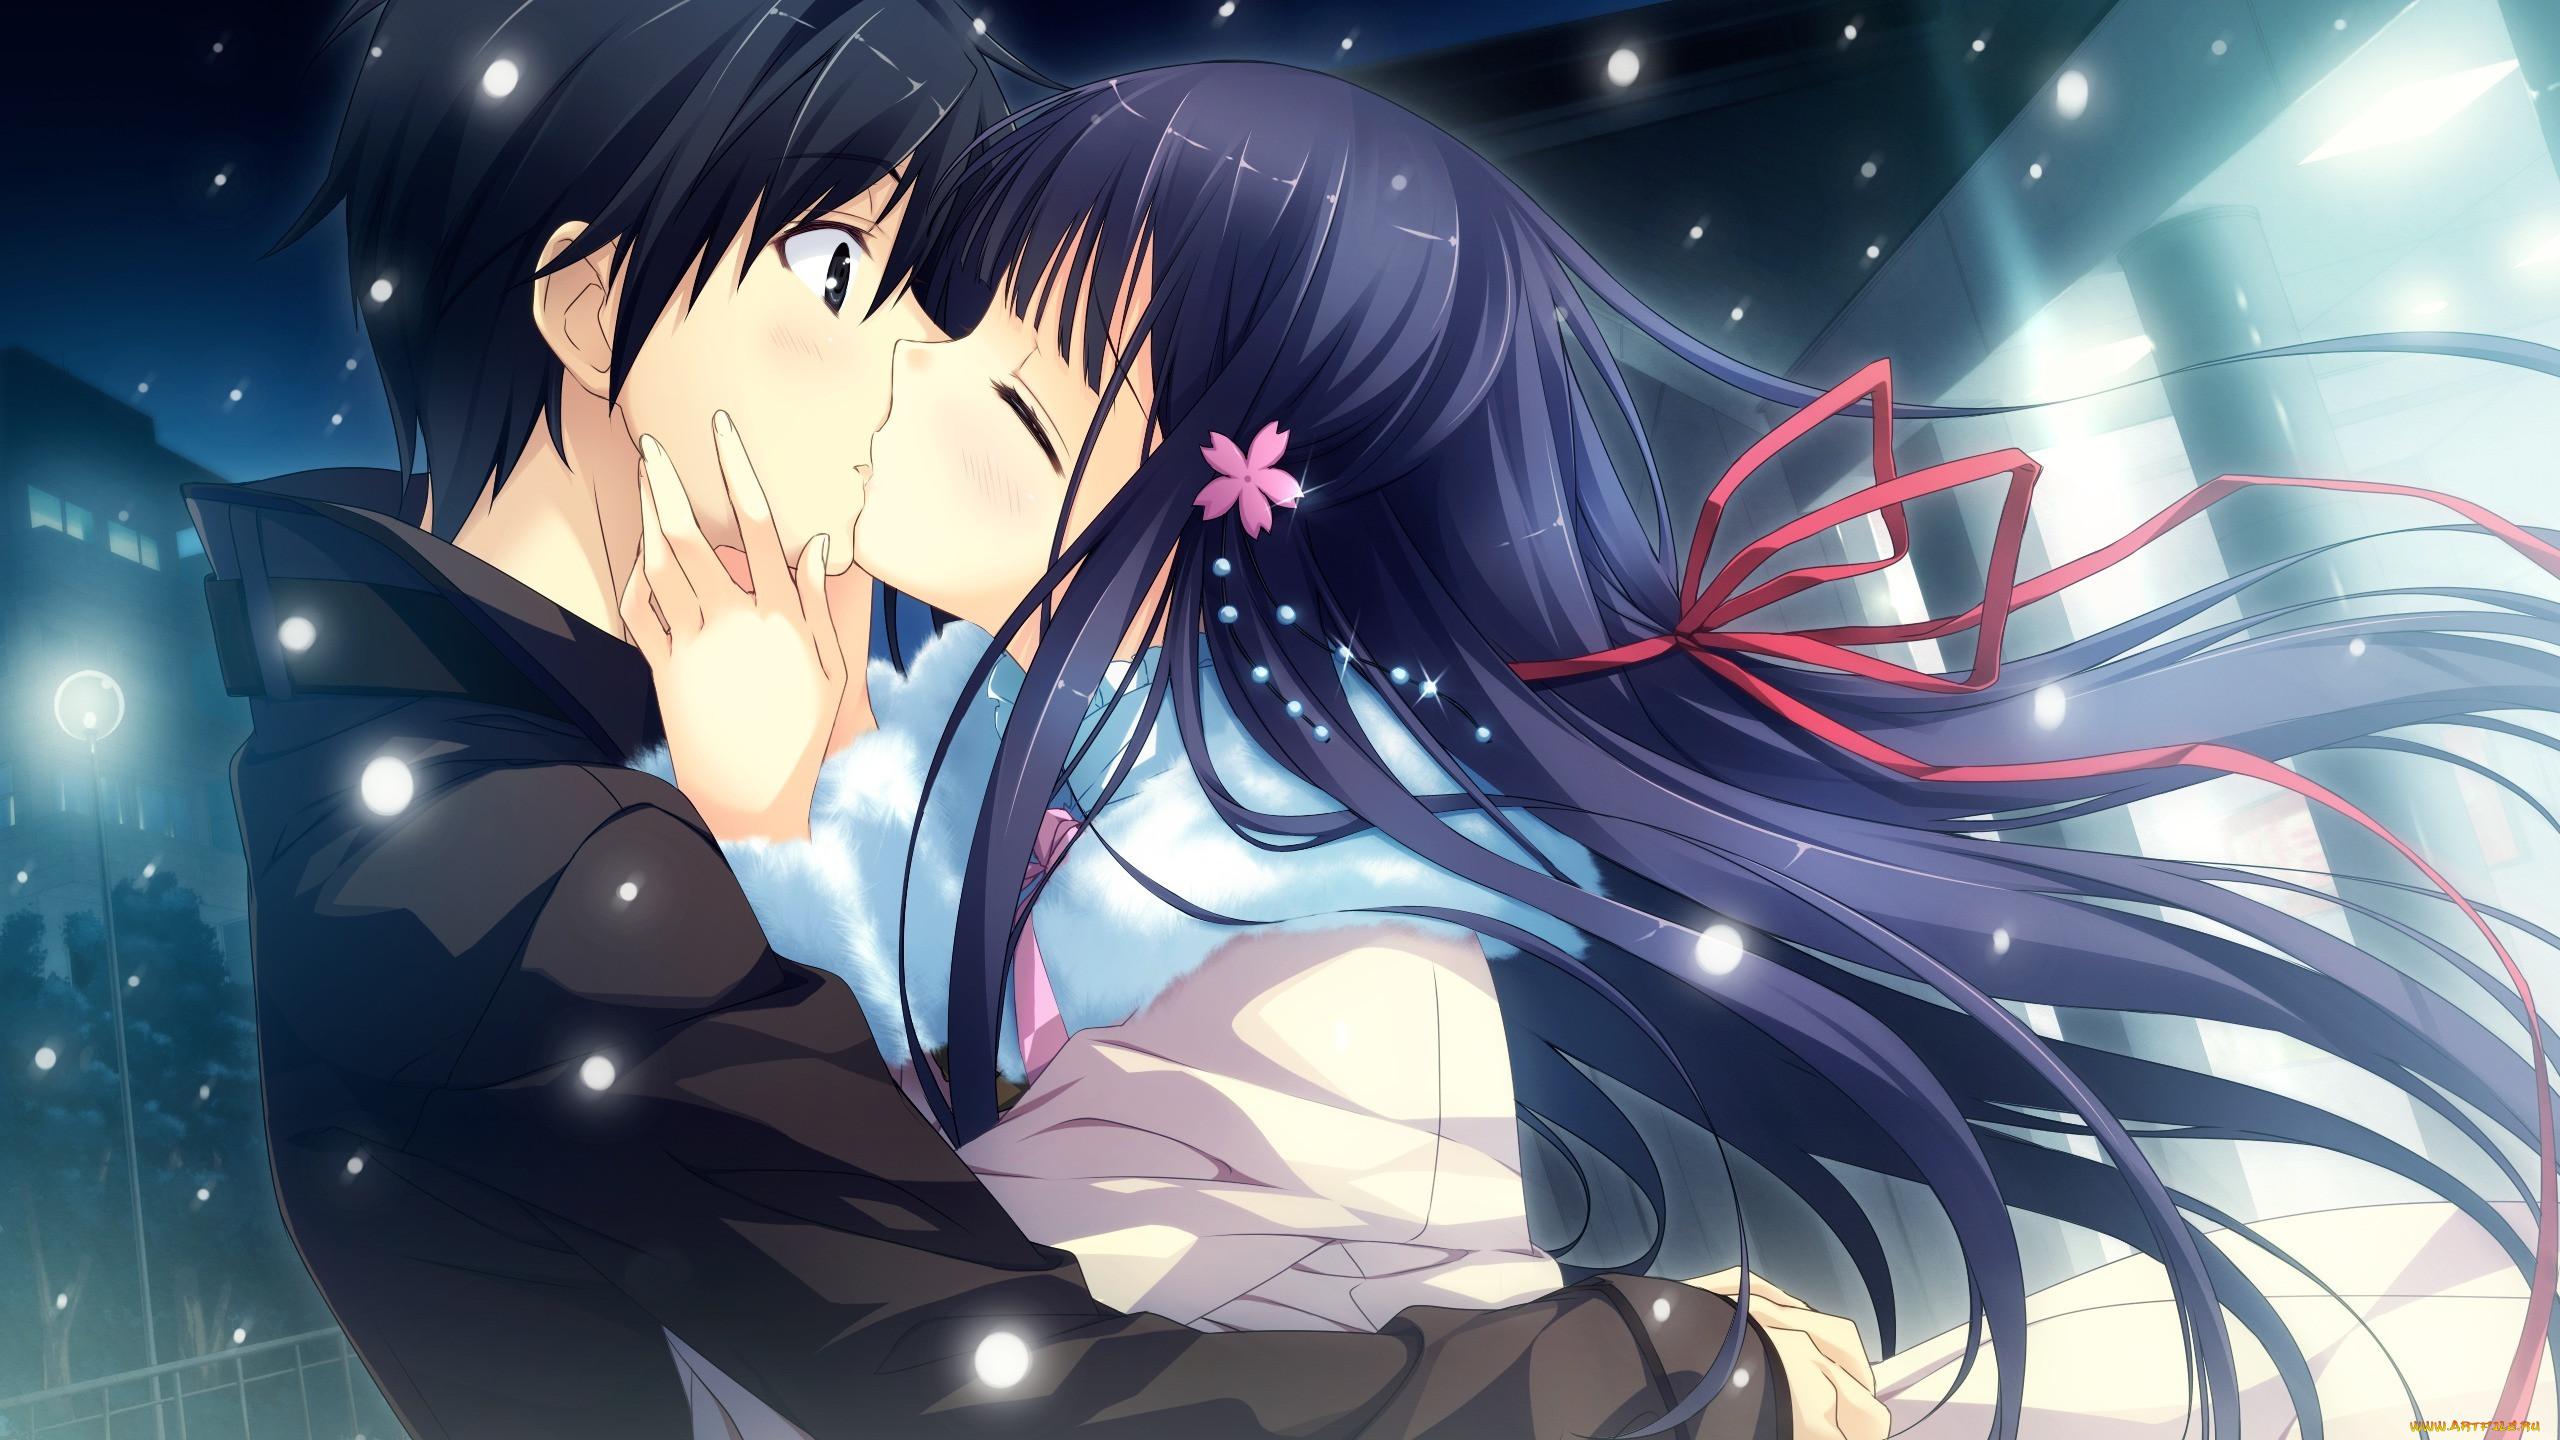 Картинки девушка целует парня аниме